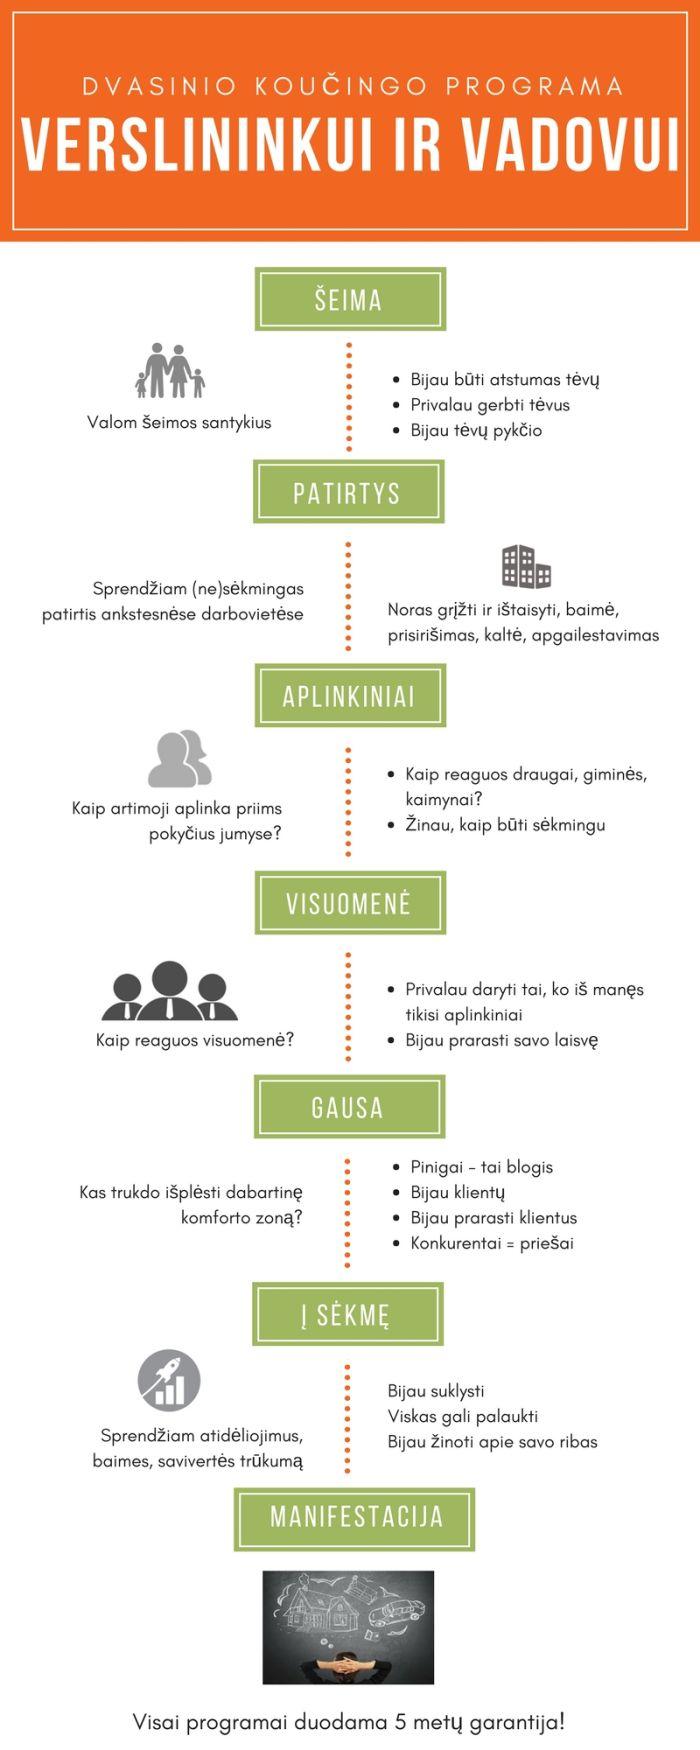 Koučingo programa verslininkui ir vadovui